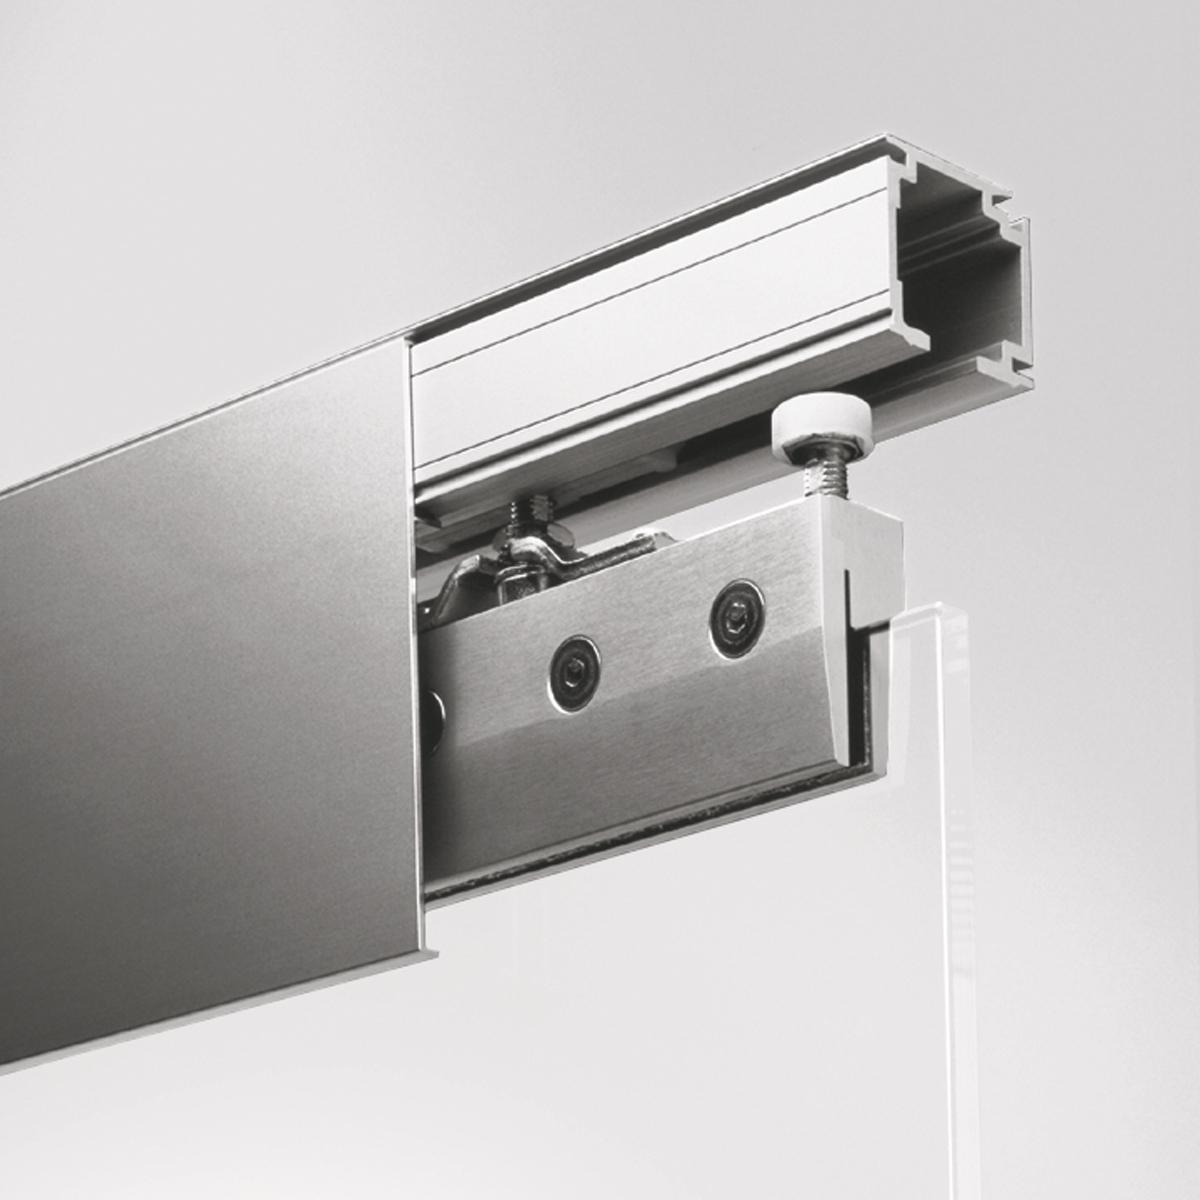 Dorma Sliding Glass Door Fittingsdorma rs 120120 syncro fittings for toughened glass room dividers